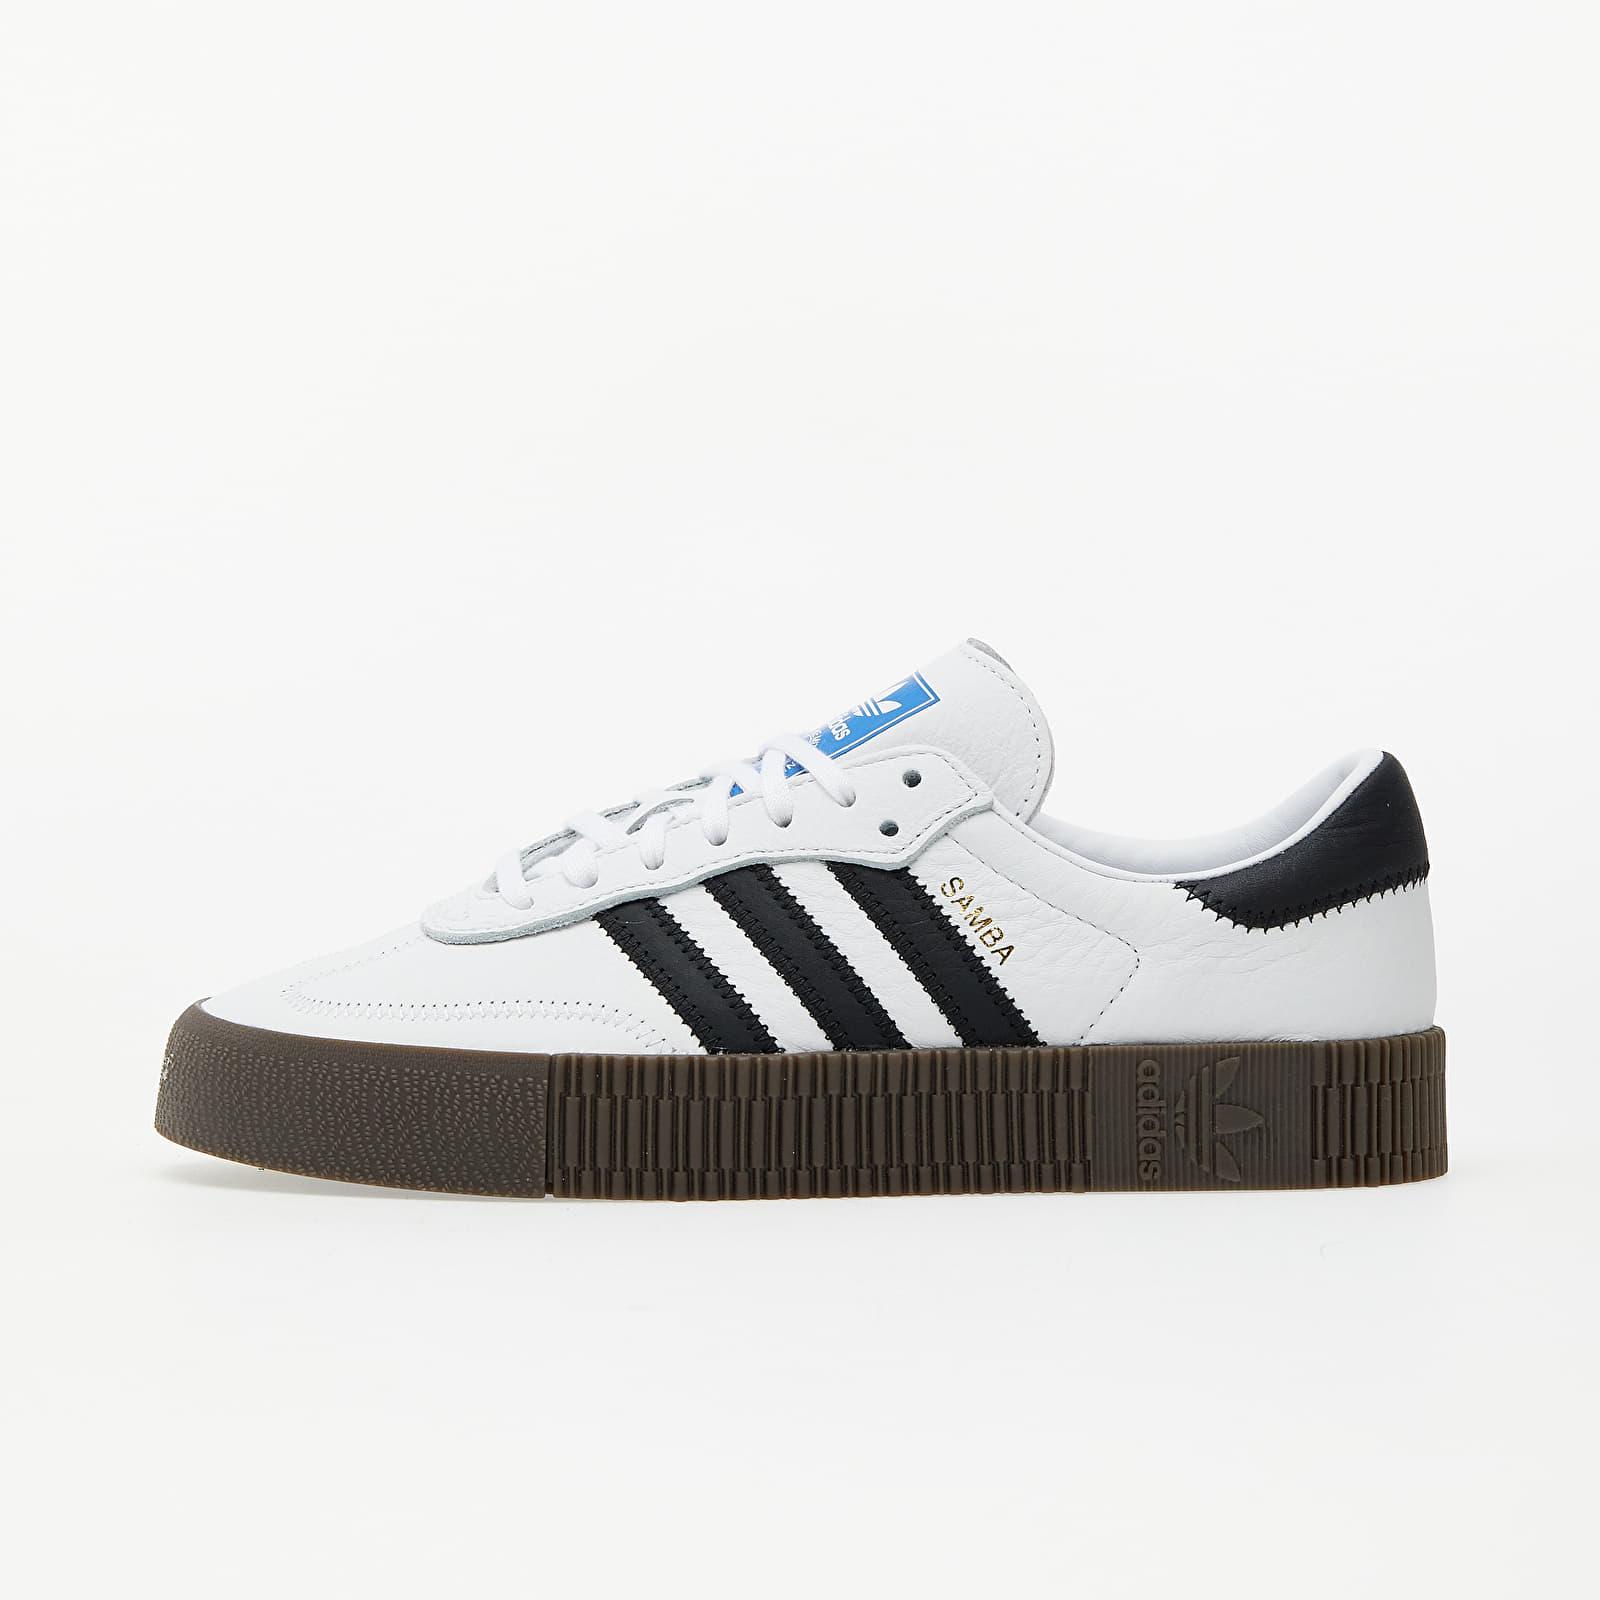 adidas Sambarose W Ftw White/ Core Black/ Gum5 EUR 36 2/3